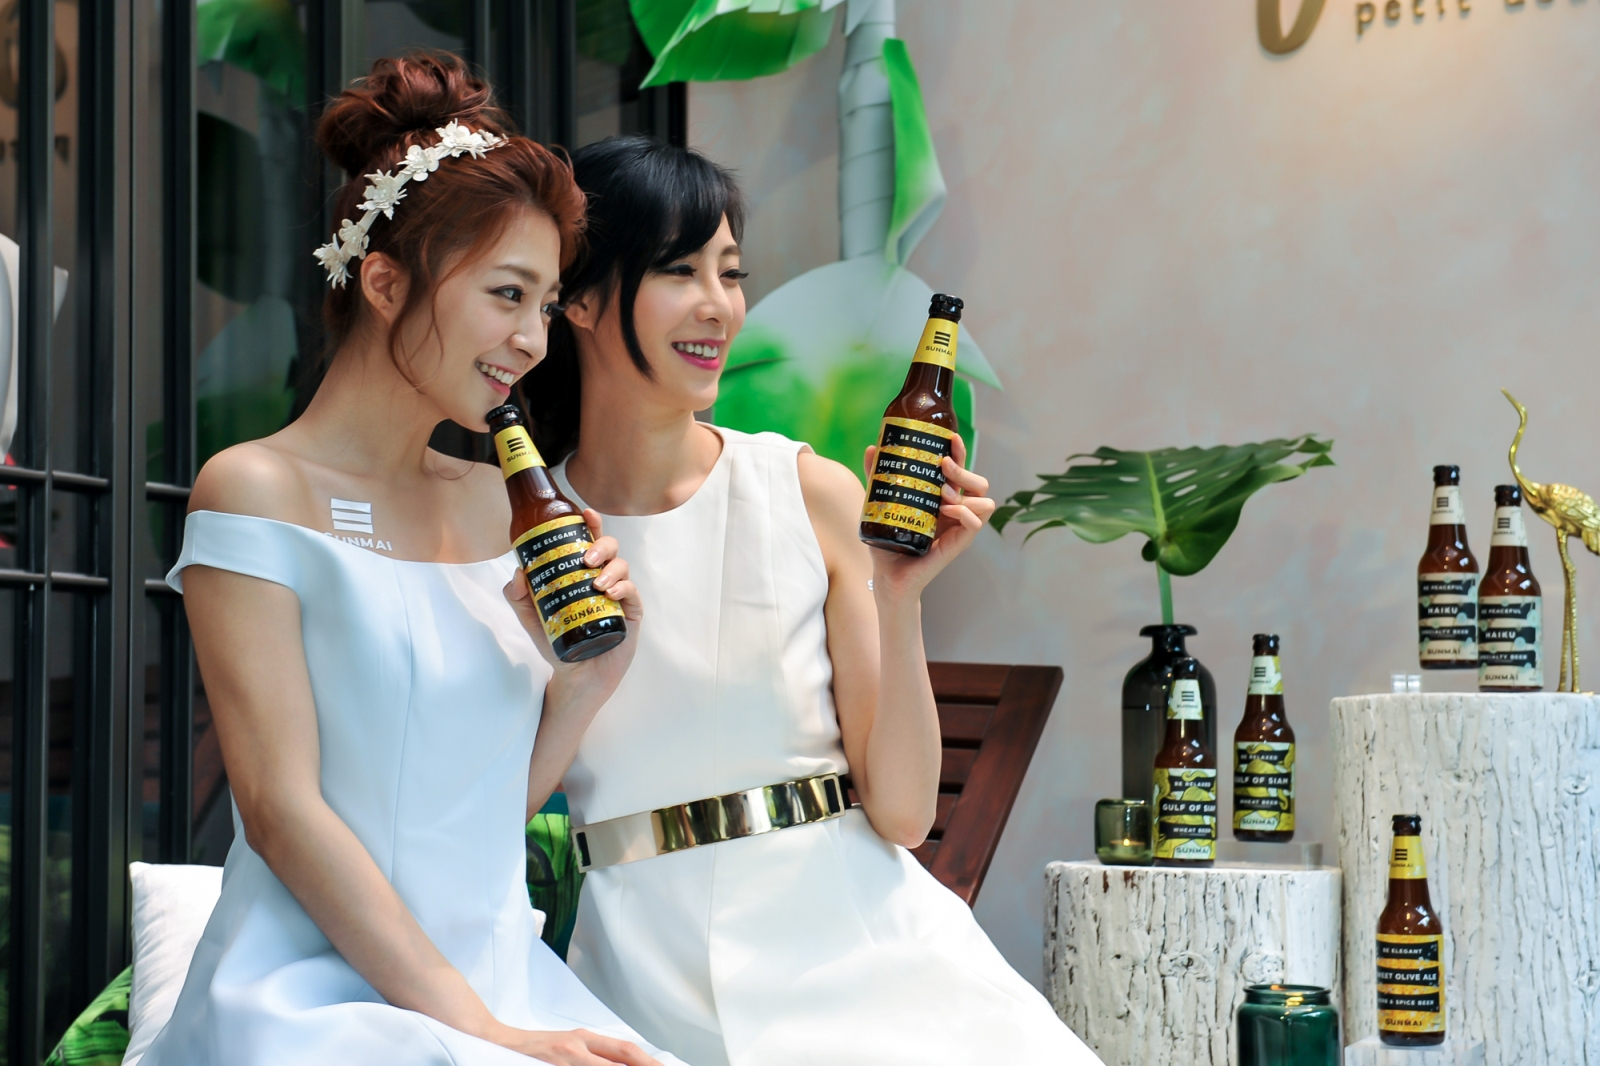 SUNMAI 春漾花草系啤酒3/23 繽紛上市